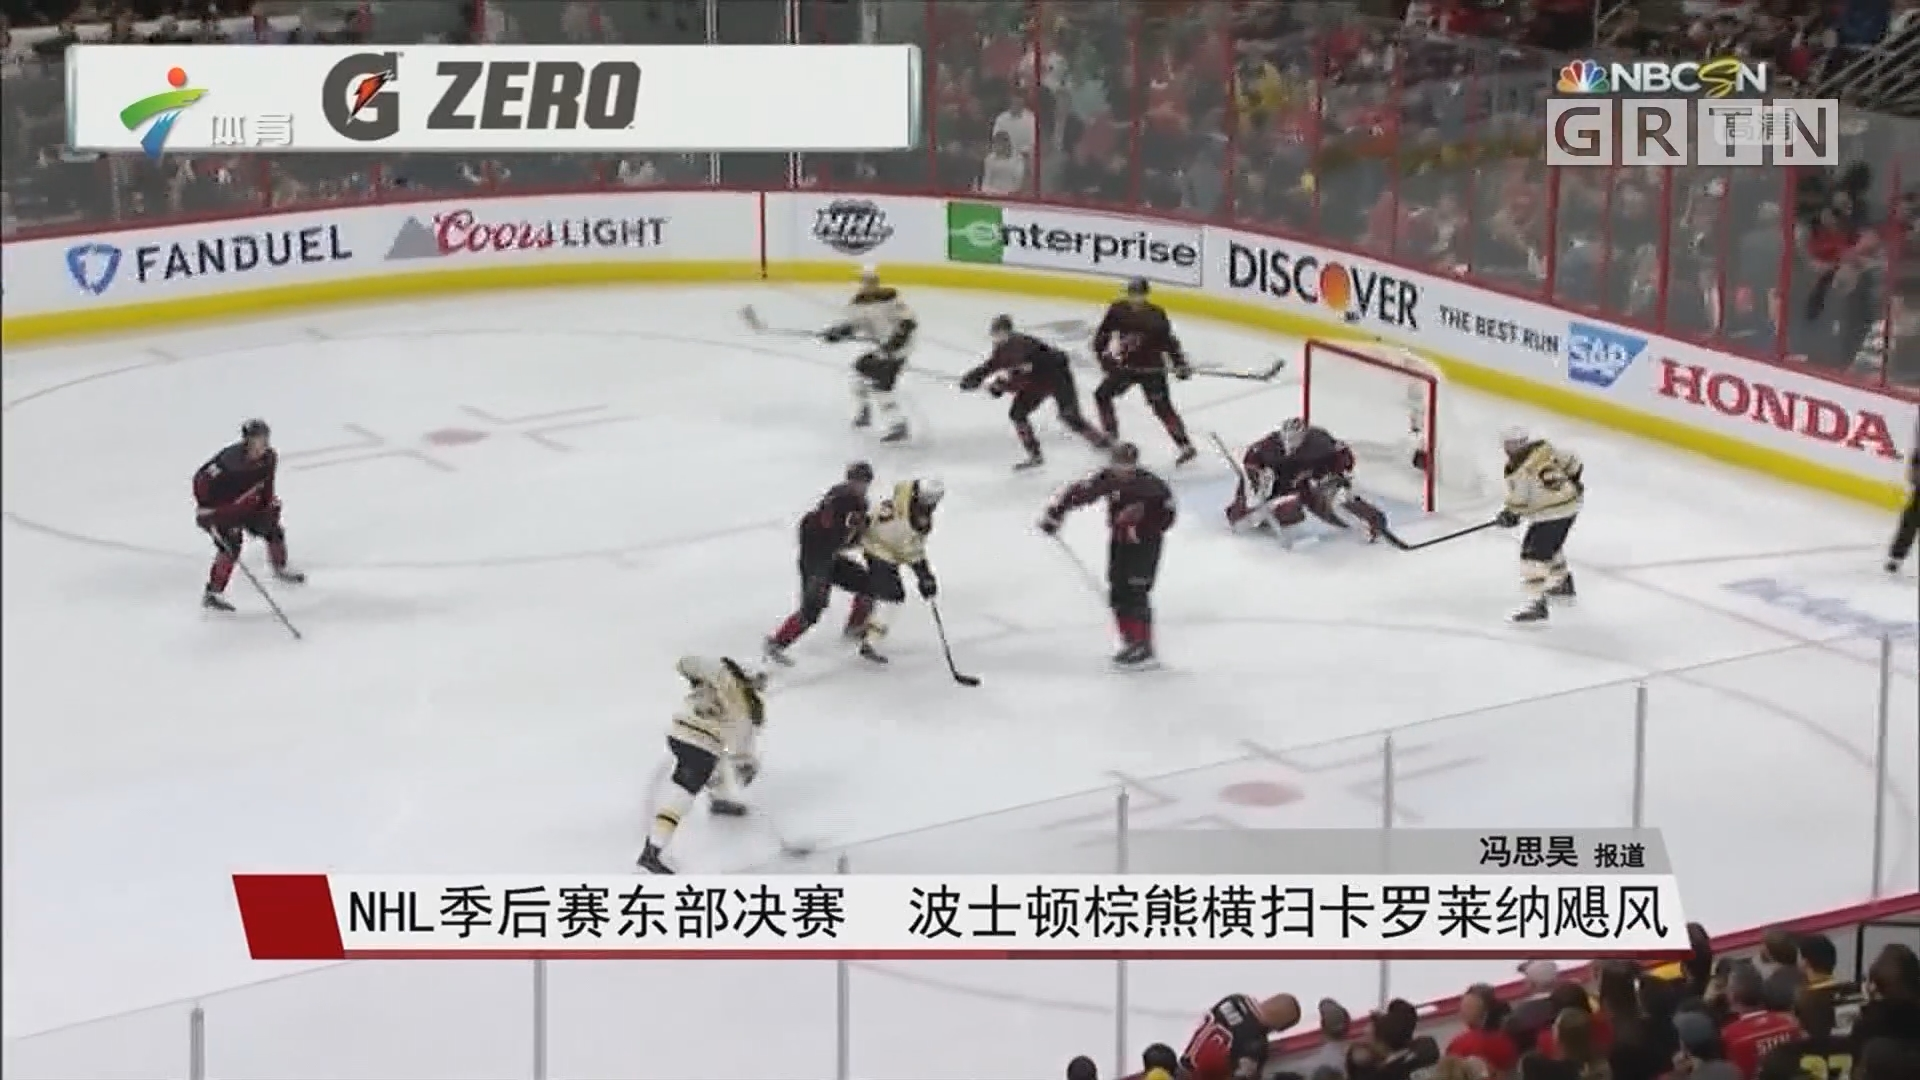 NHL季后赛东部决赛 波士顿棕熊横扫卡罗莱纳飓风